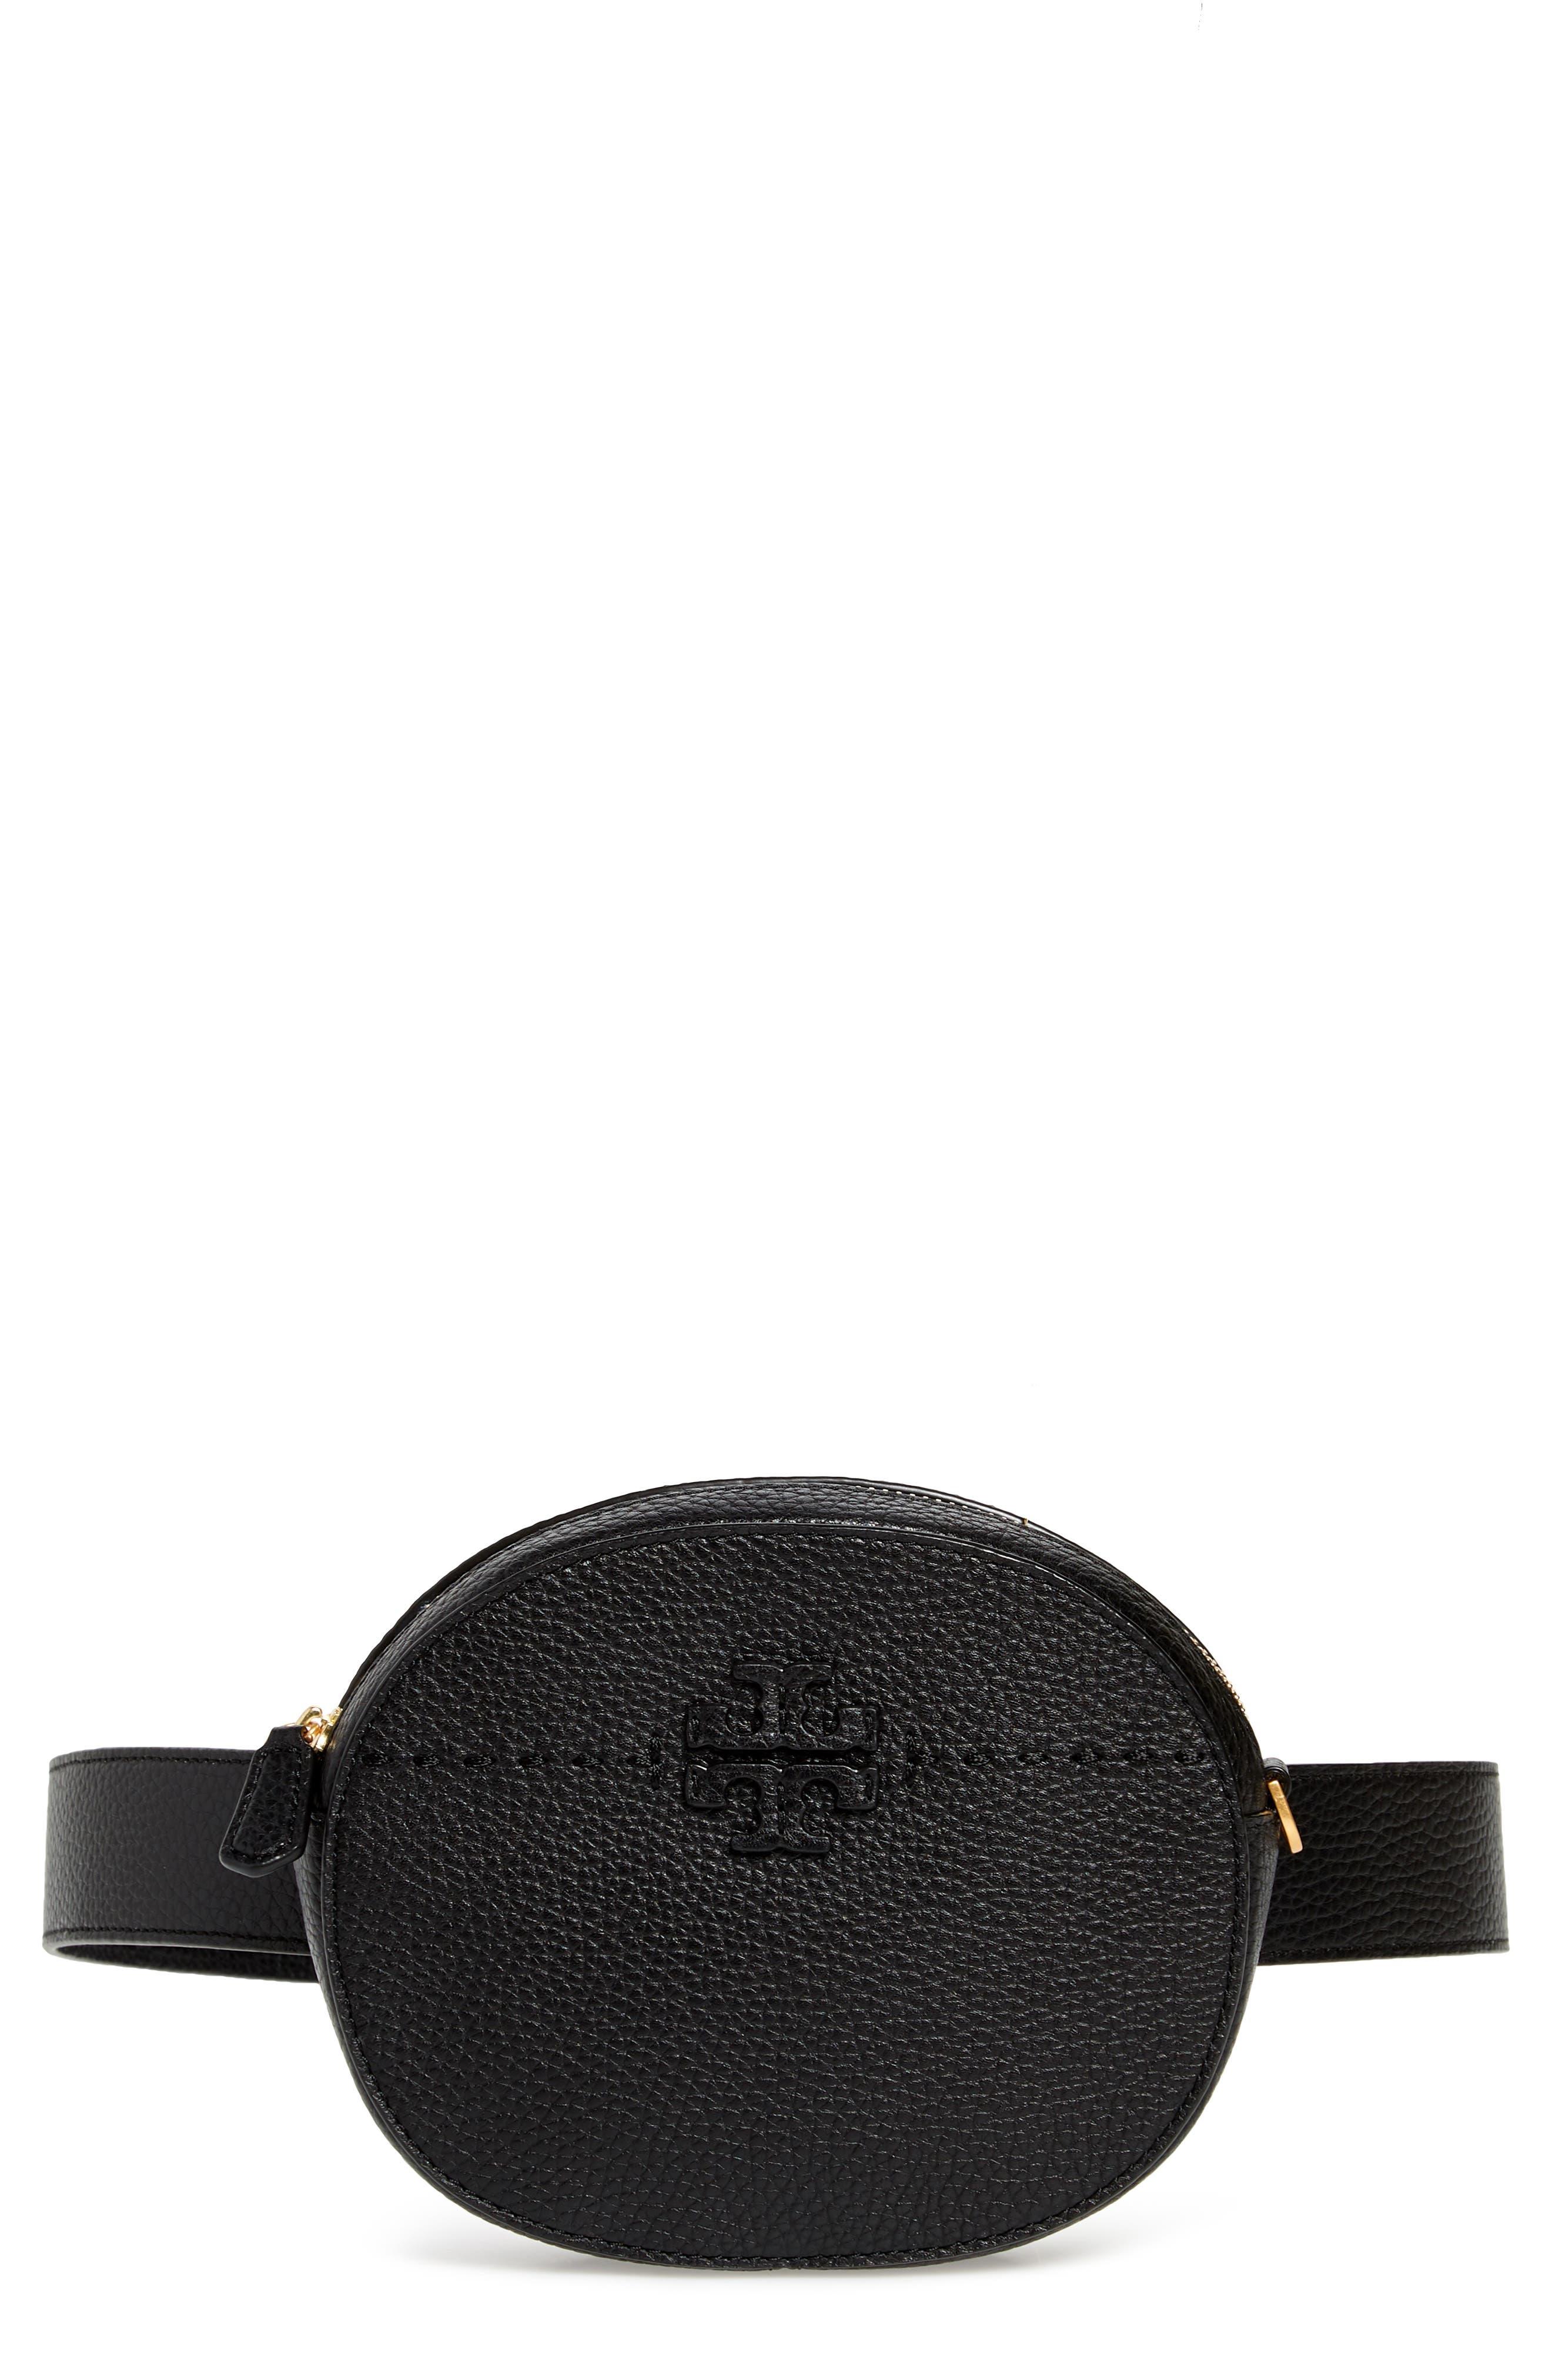 McGraw Leather Belt/Crossbody Bag, Main, color, 001